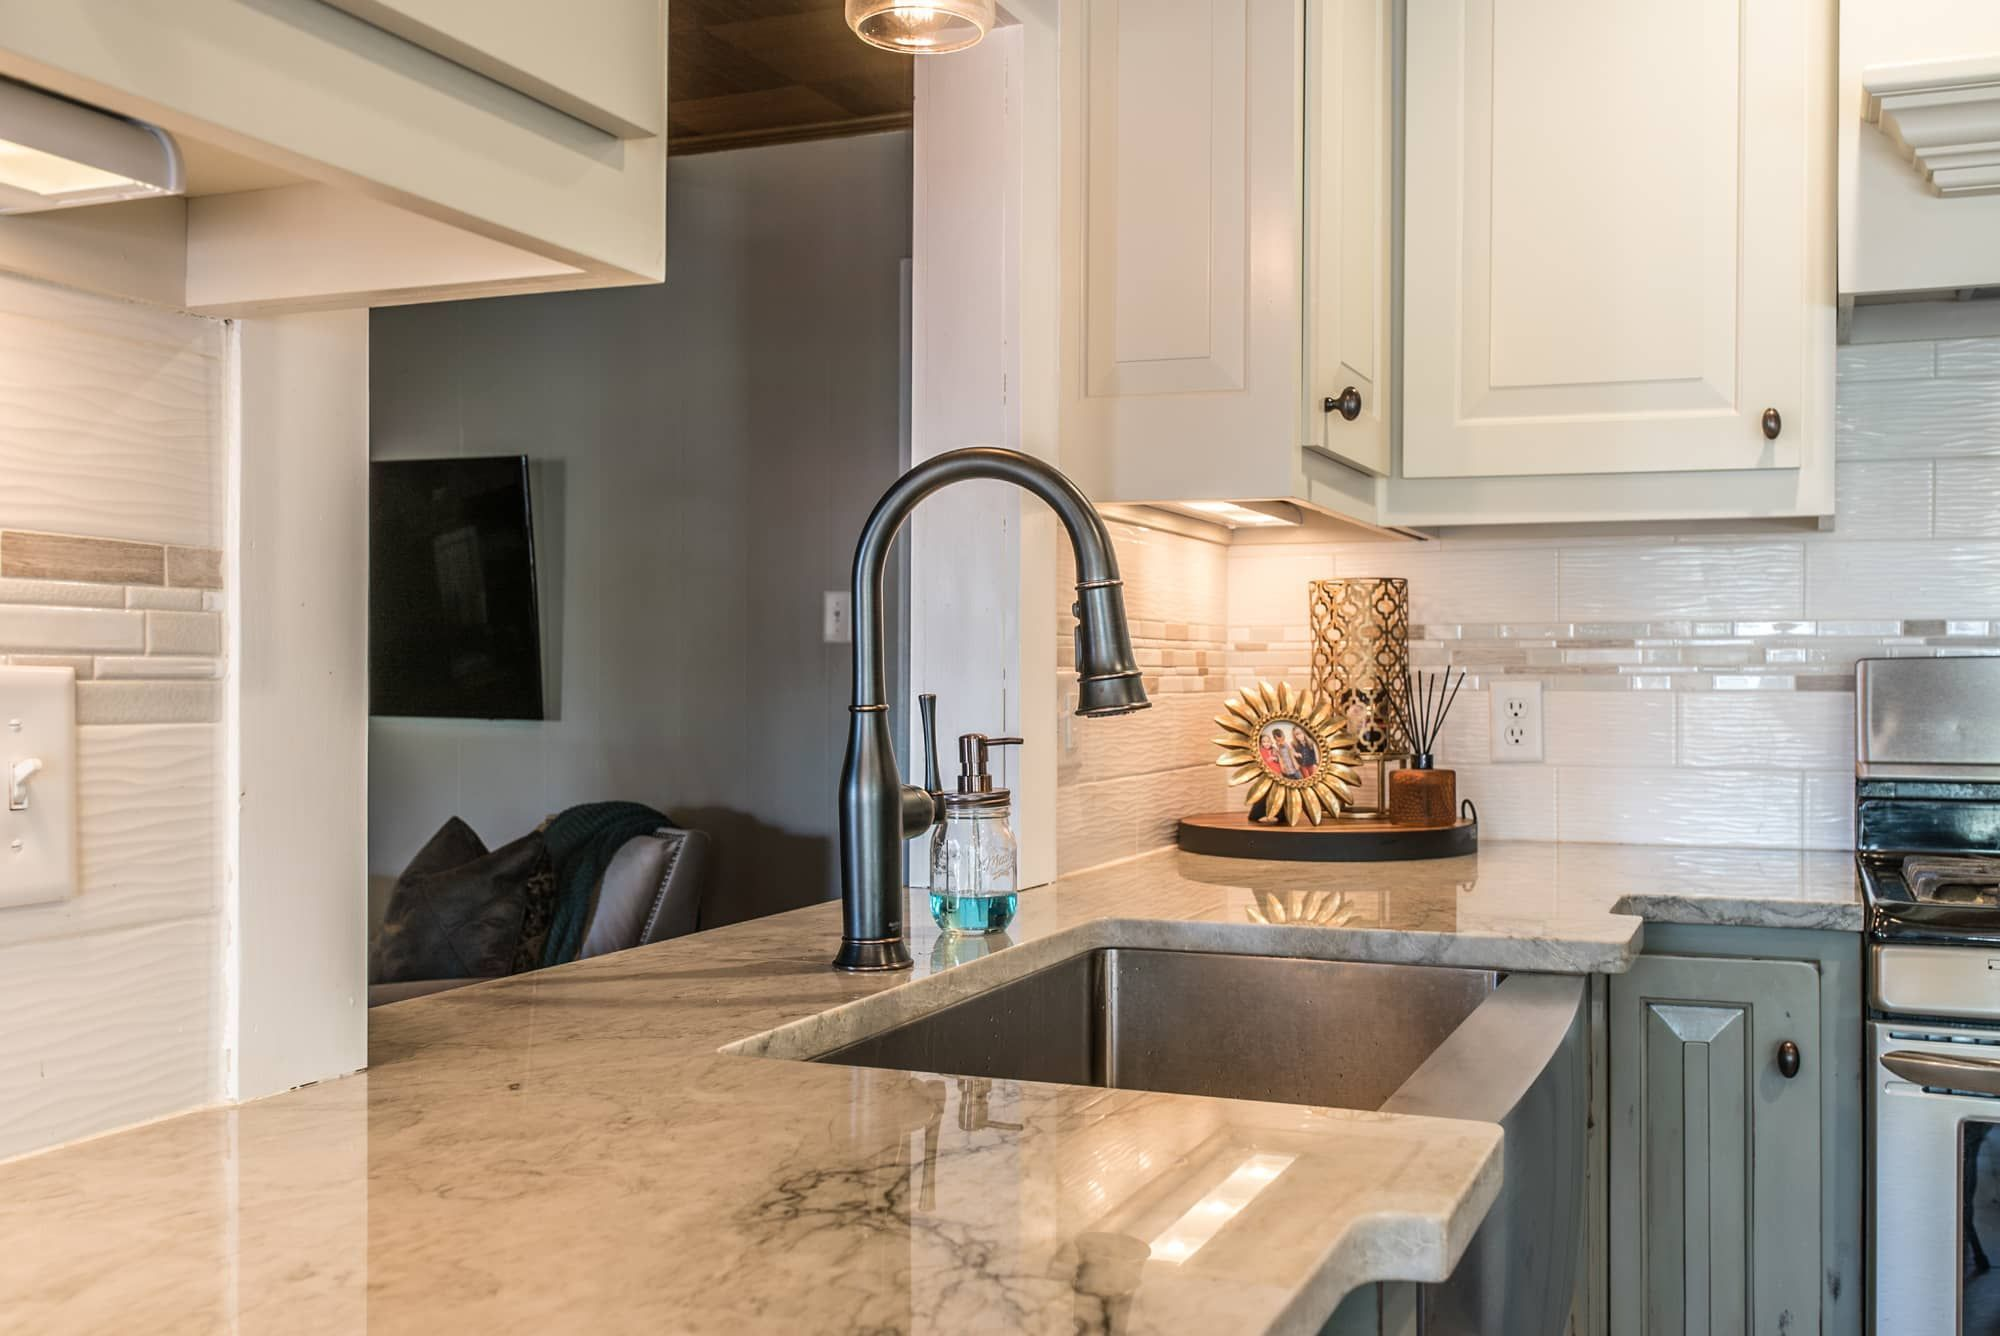 Quartzite Kitchen Countertops Sea Pearl Springfield Mo East Coast Granite Tile 5 Coast Countertops East Granite In 2020 Countertops Kitchen Countertops Granite Tile